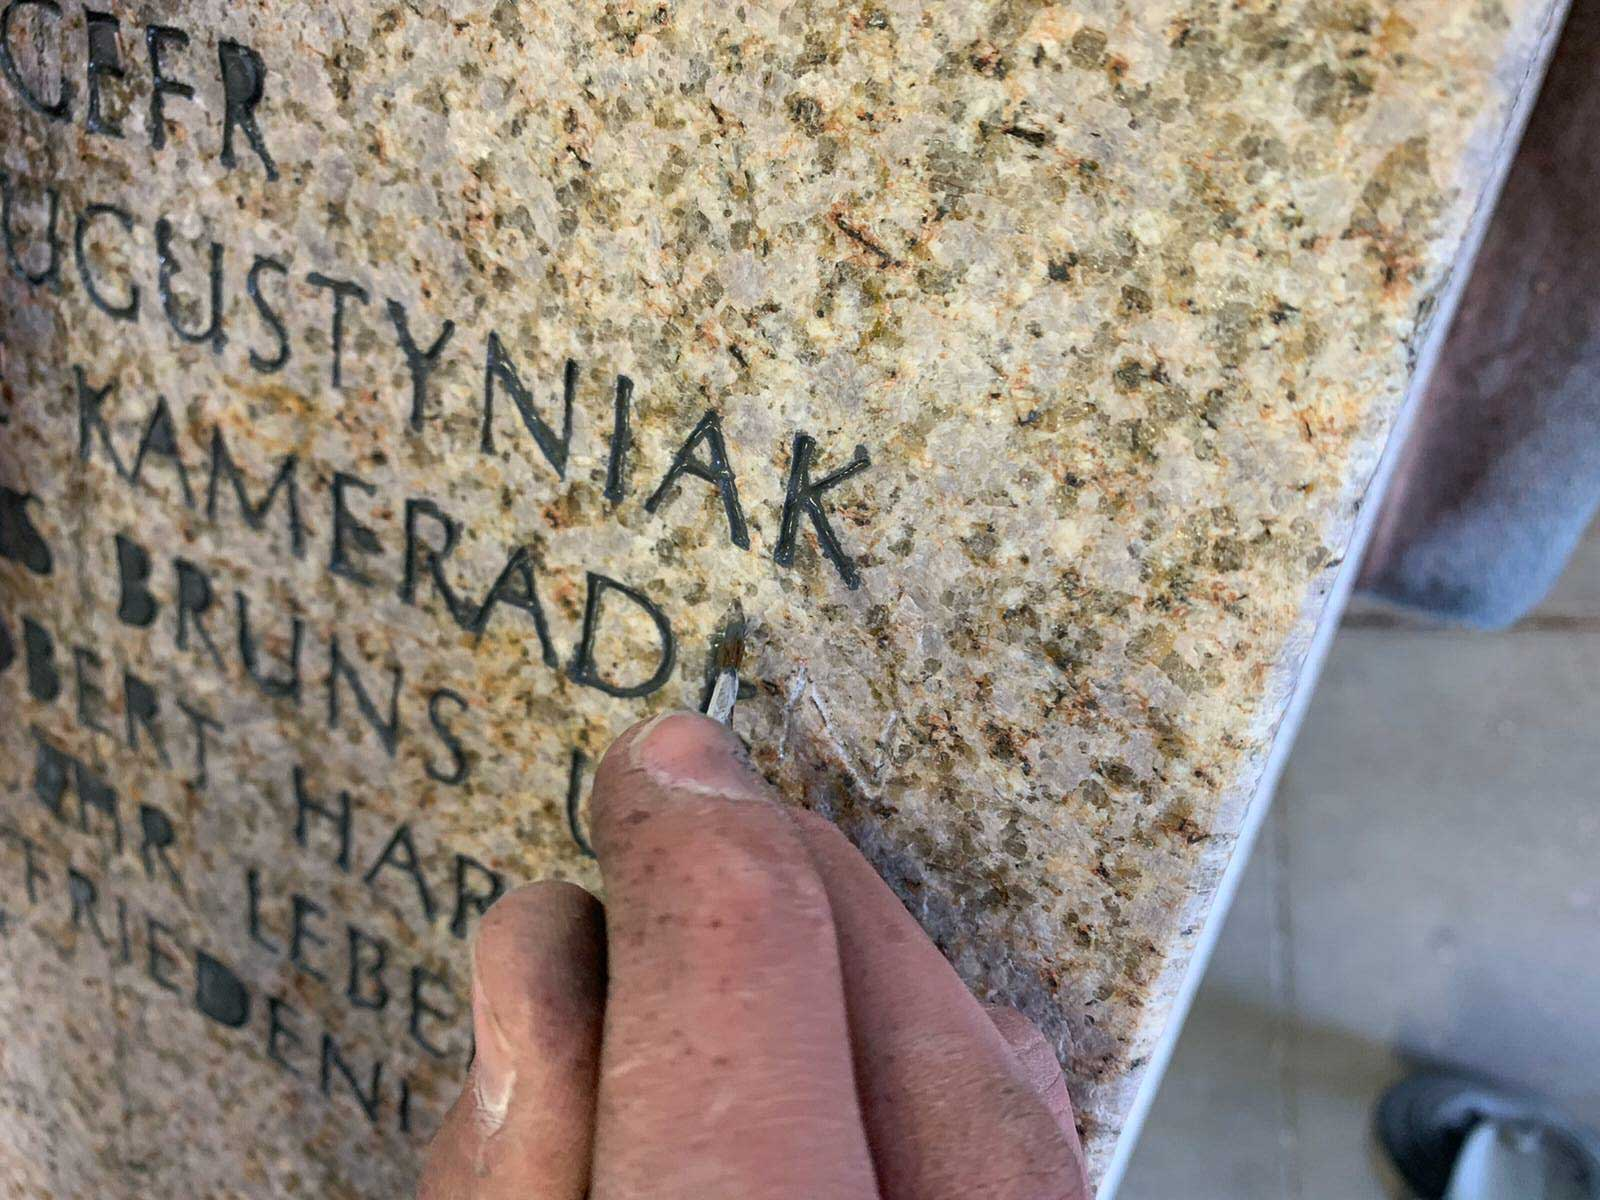 Stele-Martin-Augustyniak-Veteranenkultur13